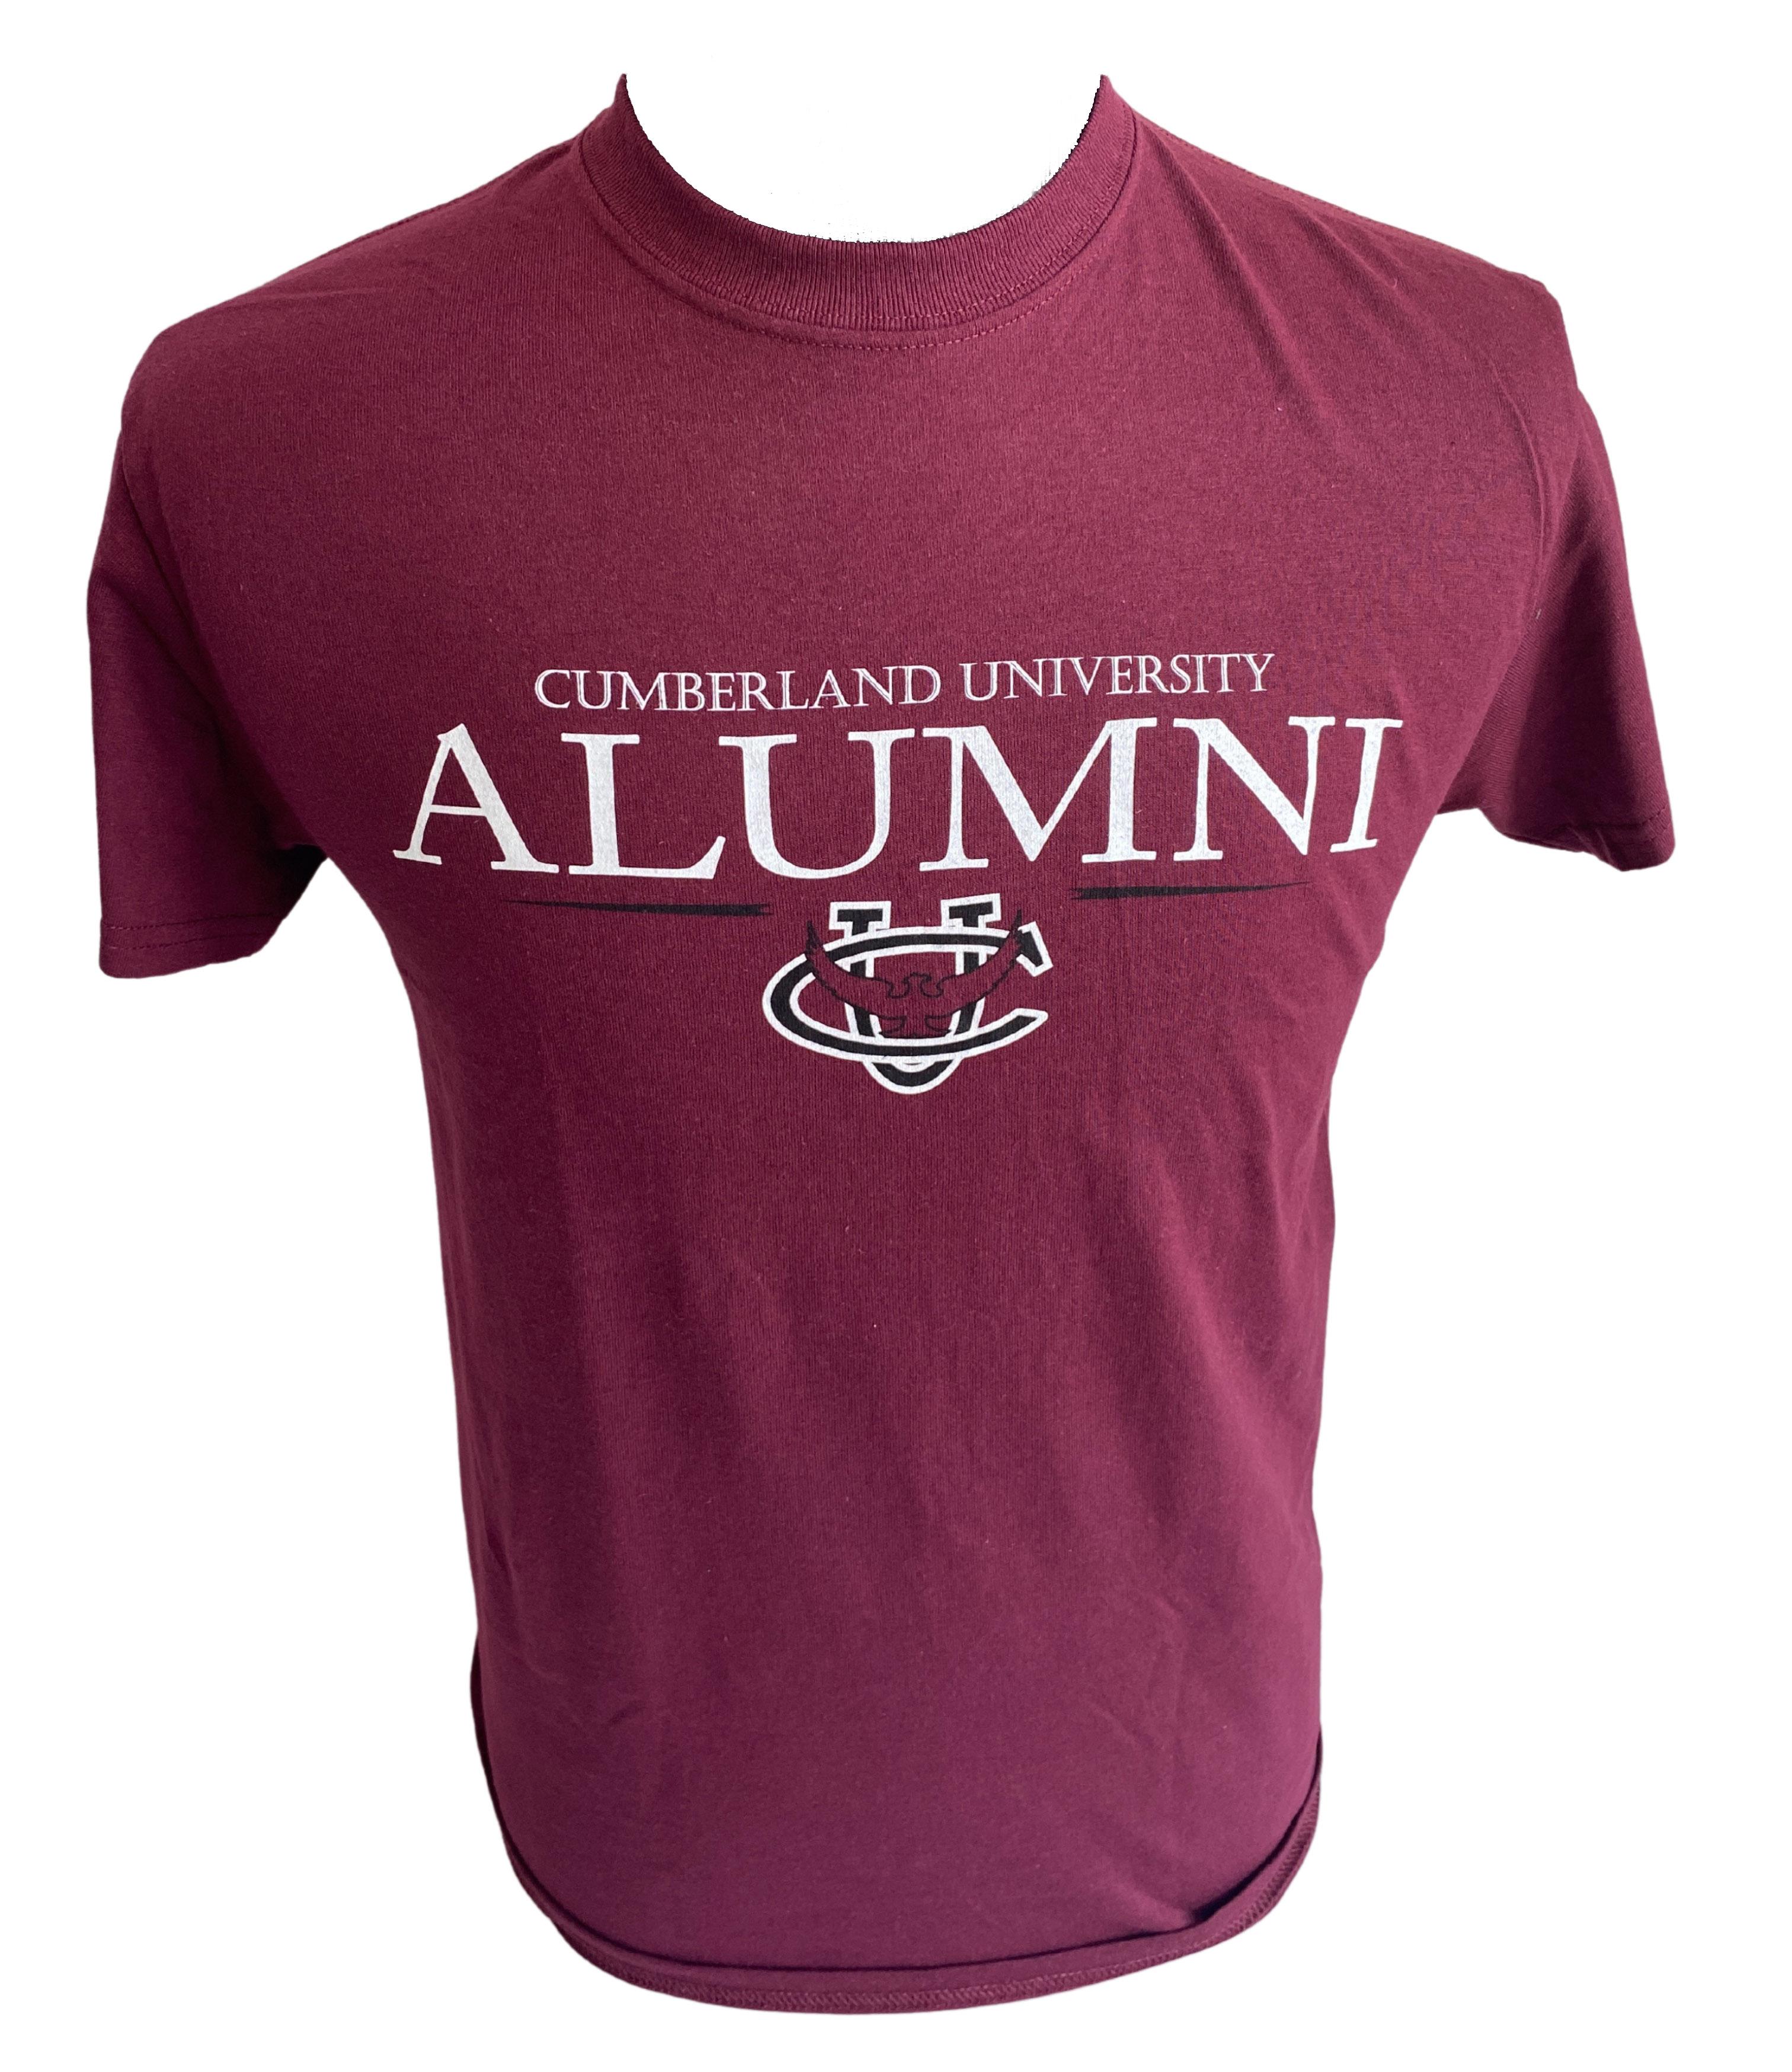 Cumberland University Alumni CU Logo Tshirt